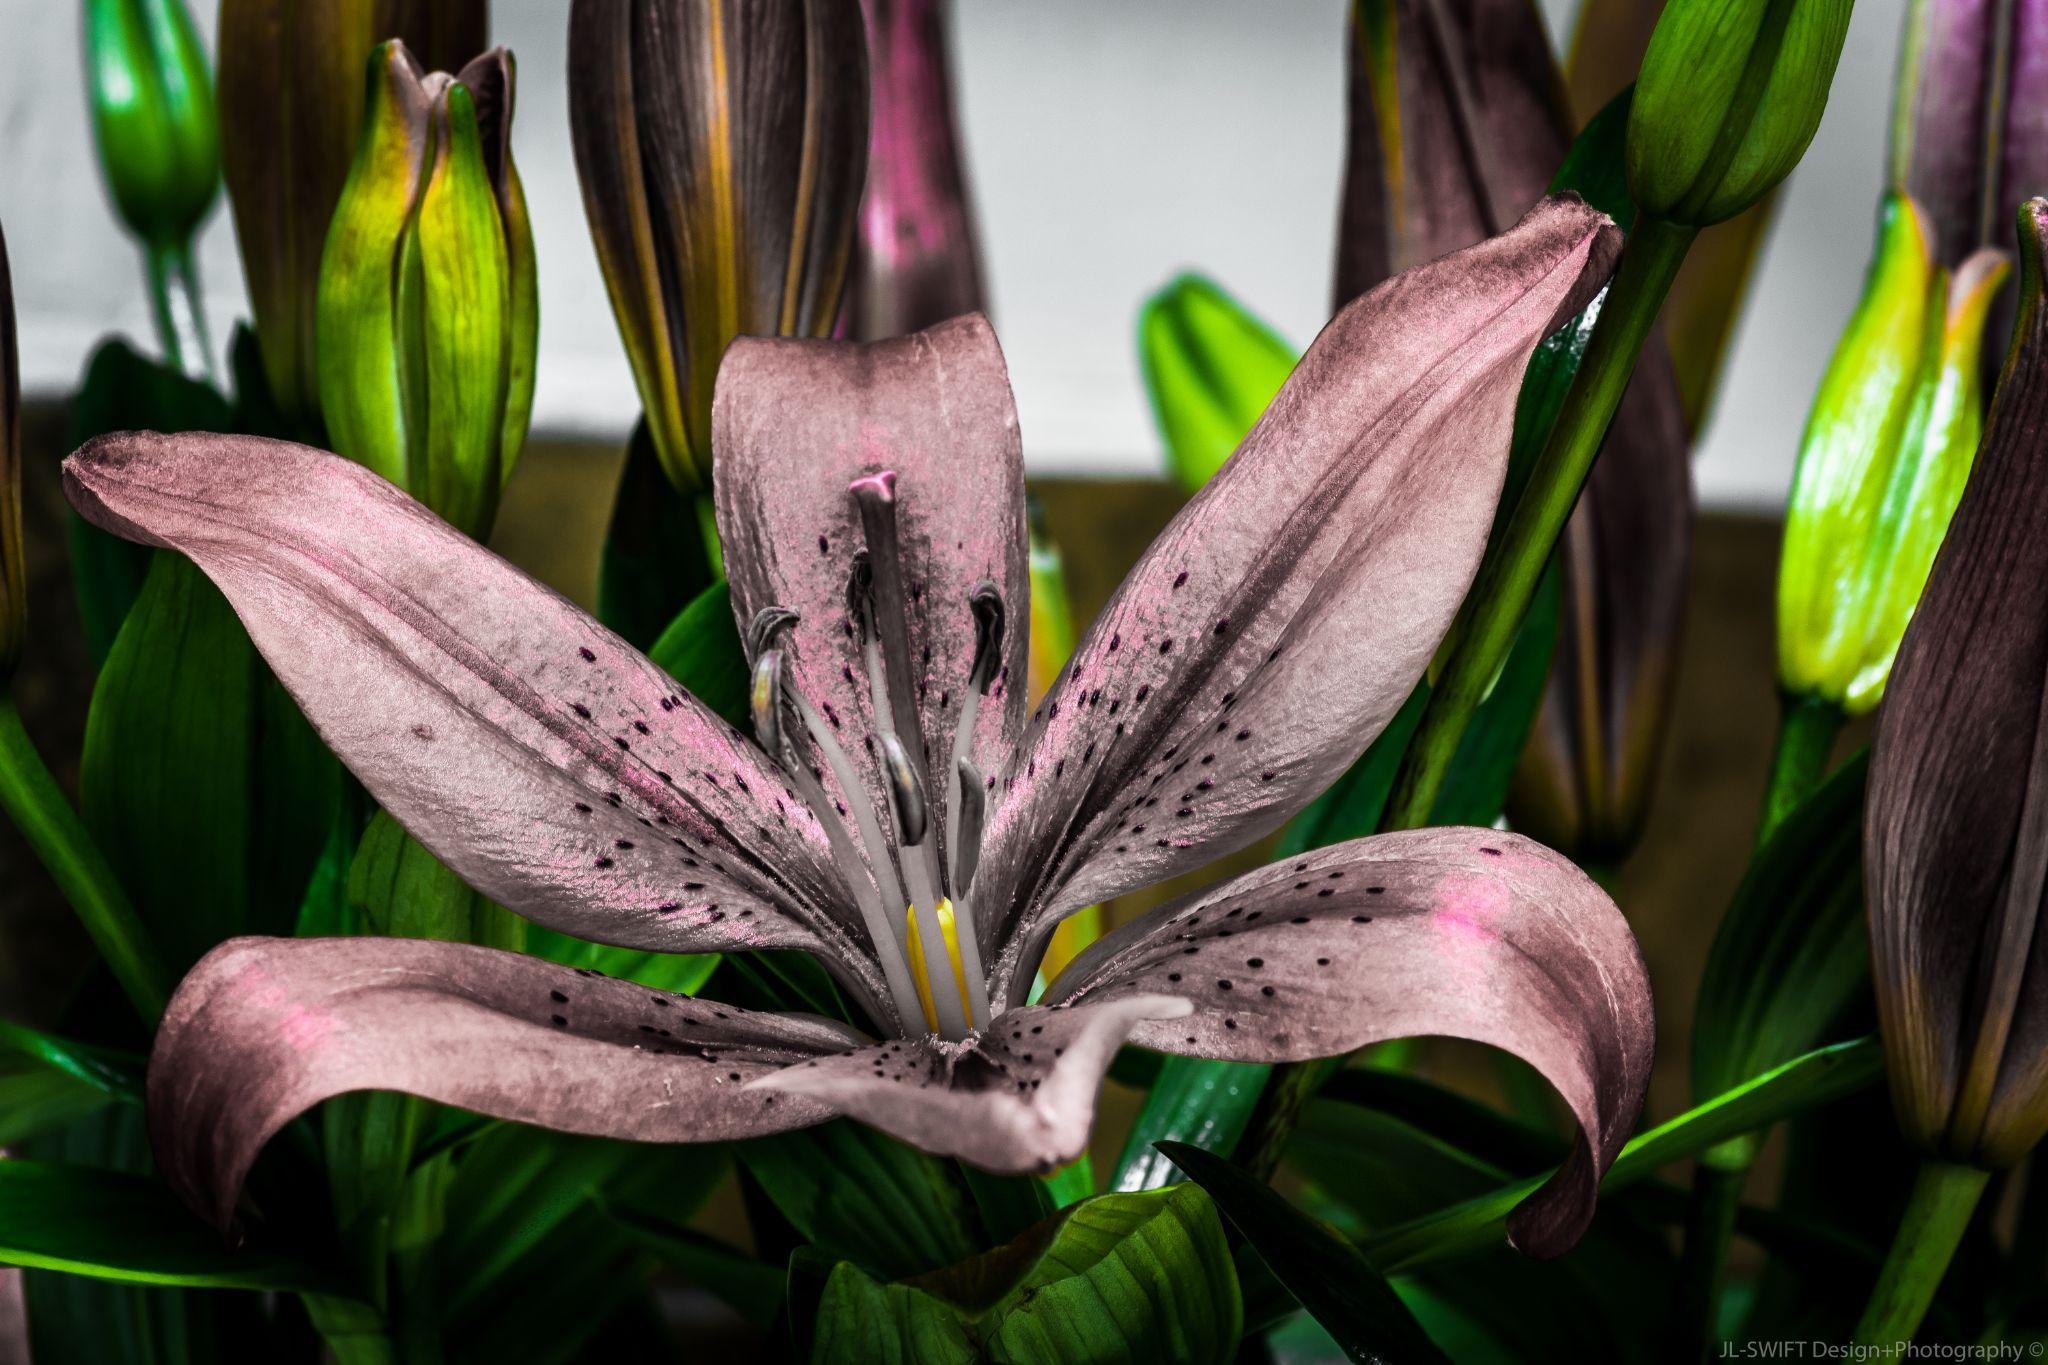 Flowers - SilverPink by JLSWIFTdesign